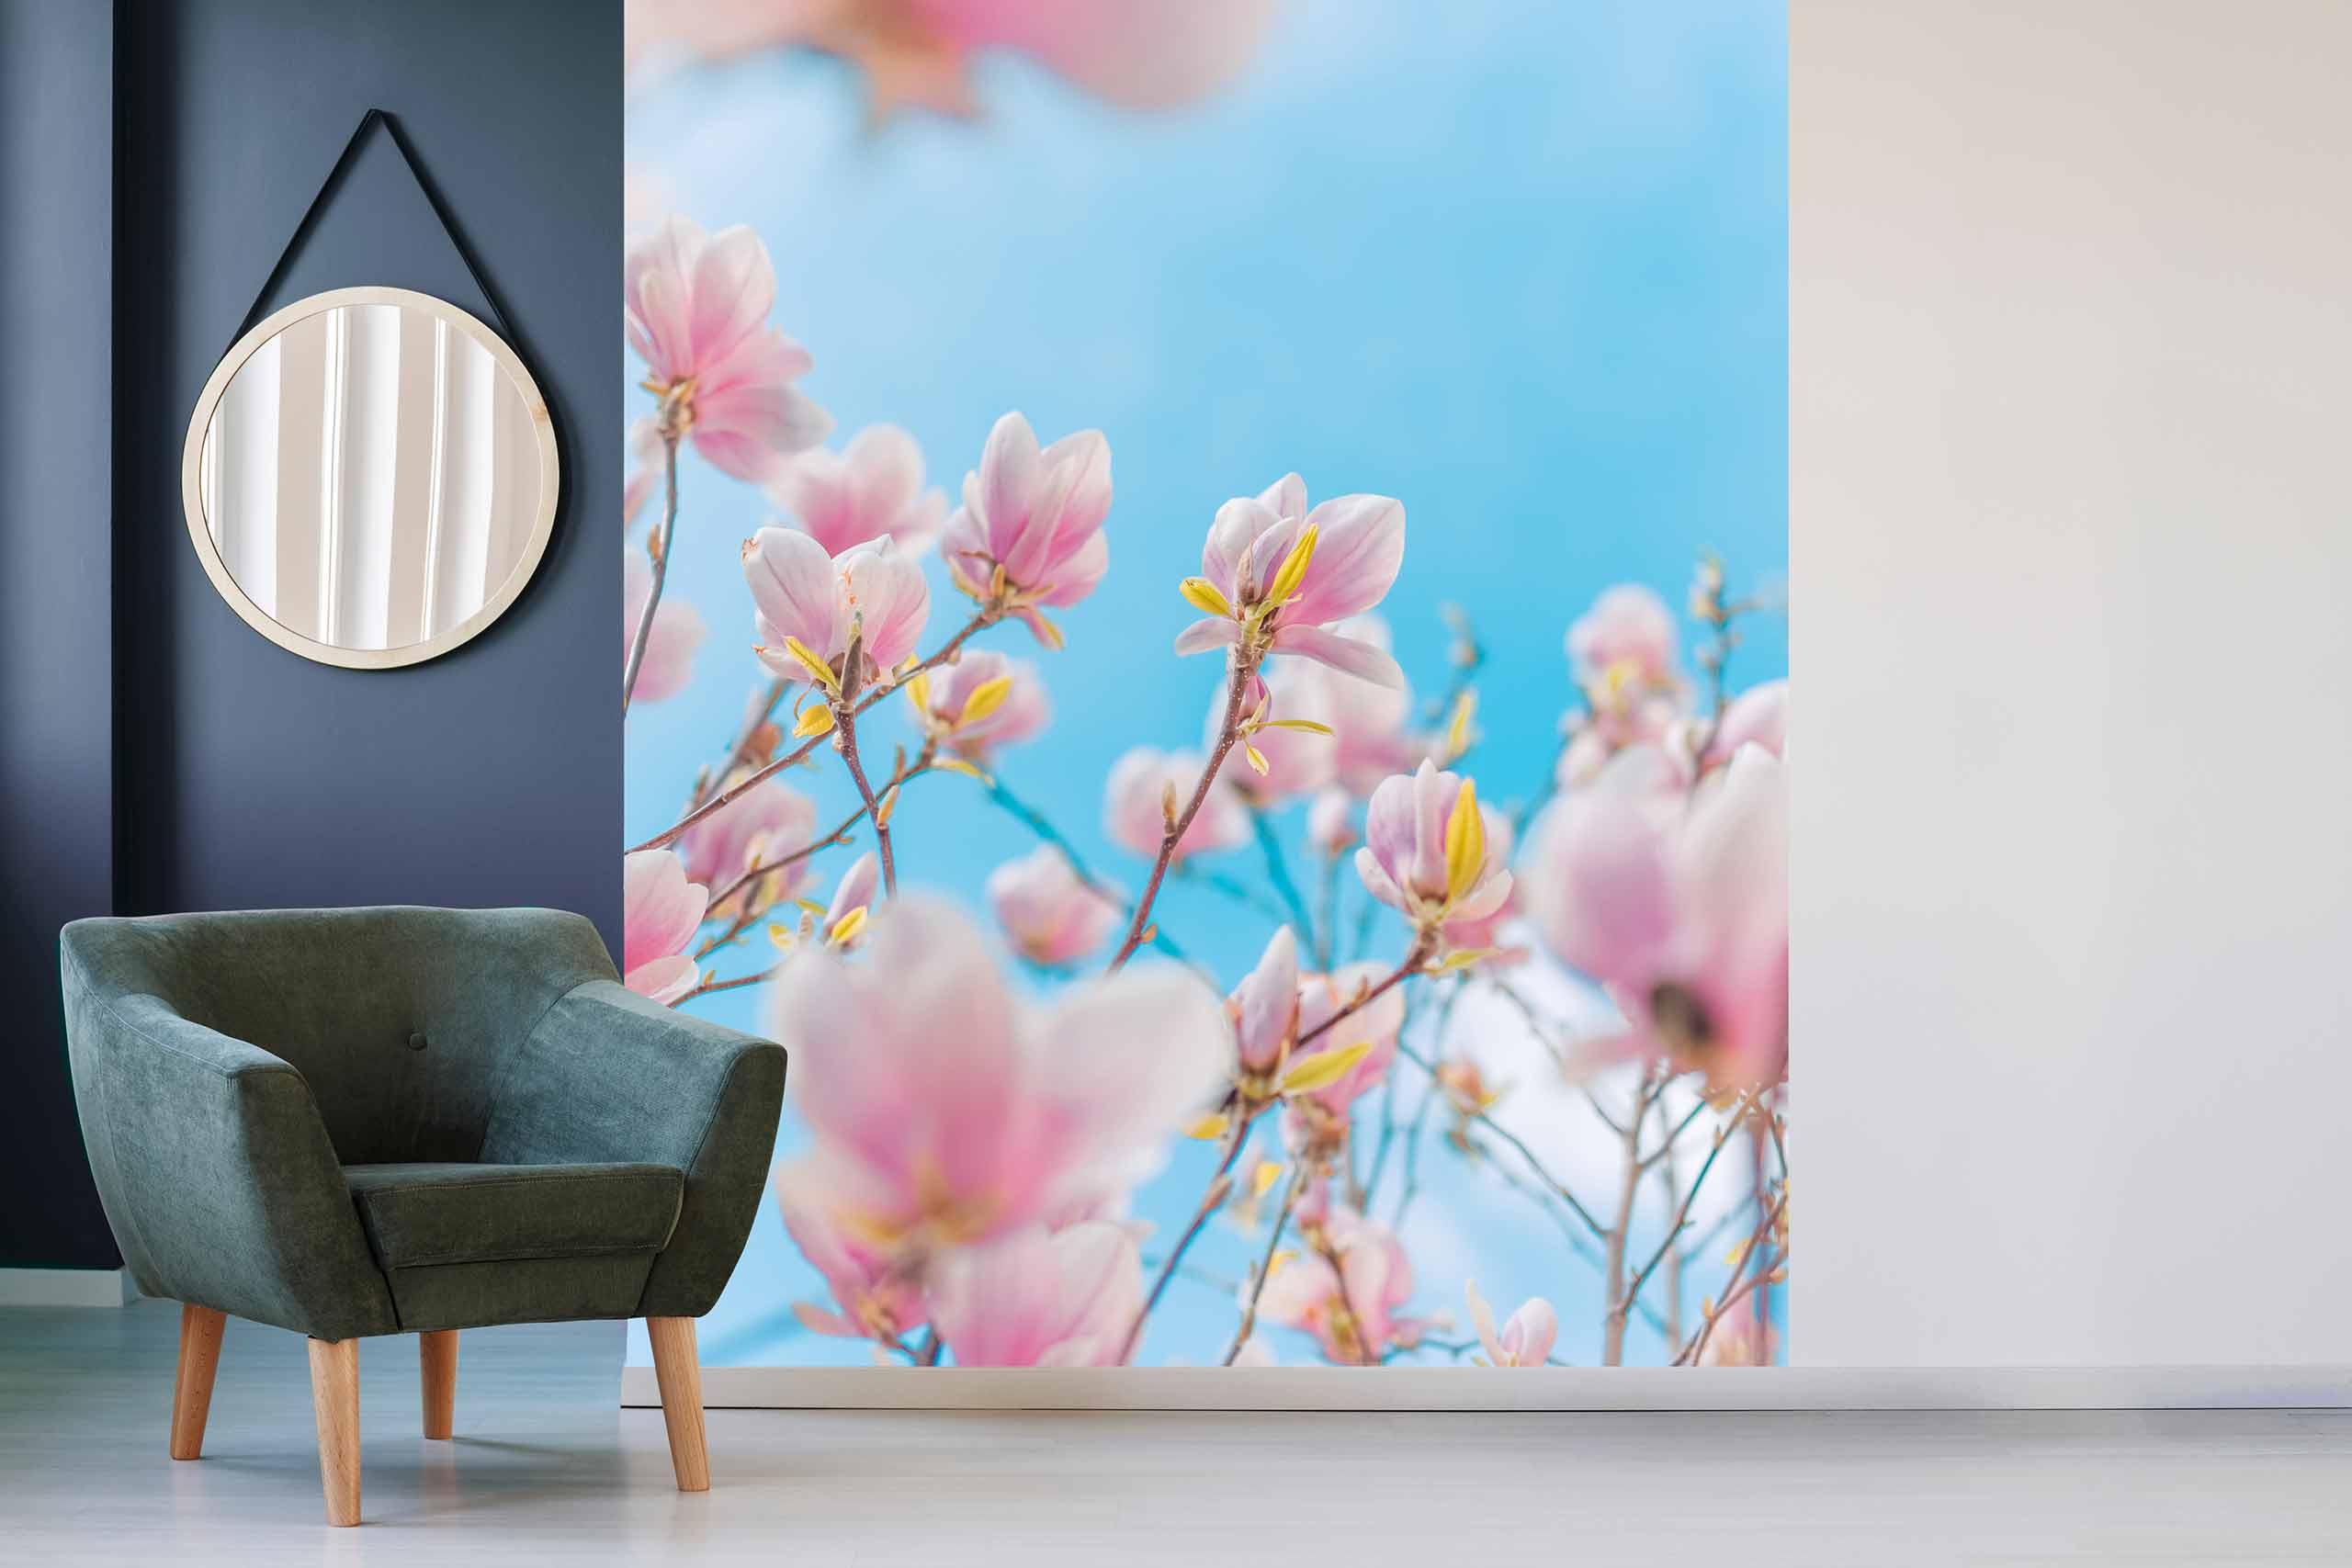 Vlies Tapete 225 Fototapete Höhe 250cm Motiv 124 Blüten Baum